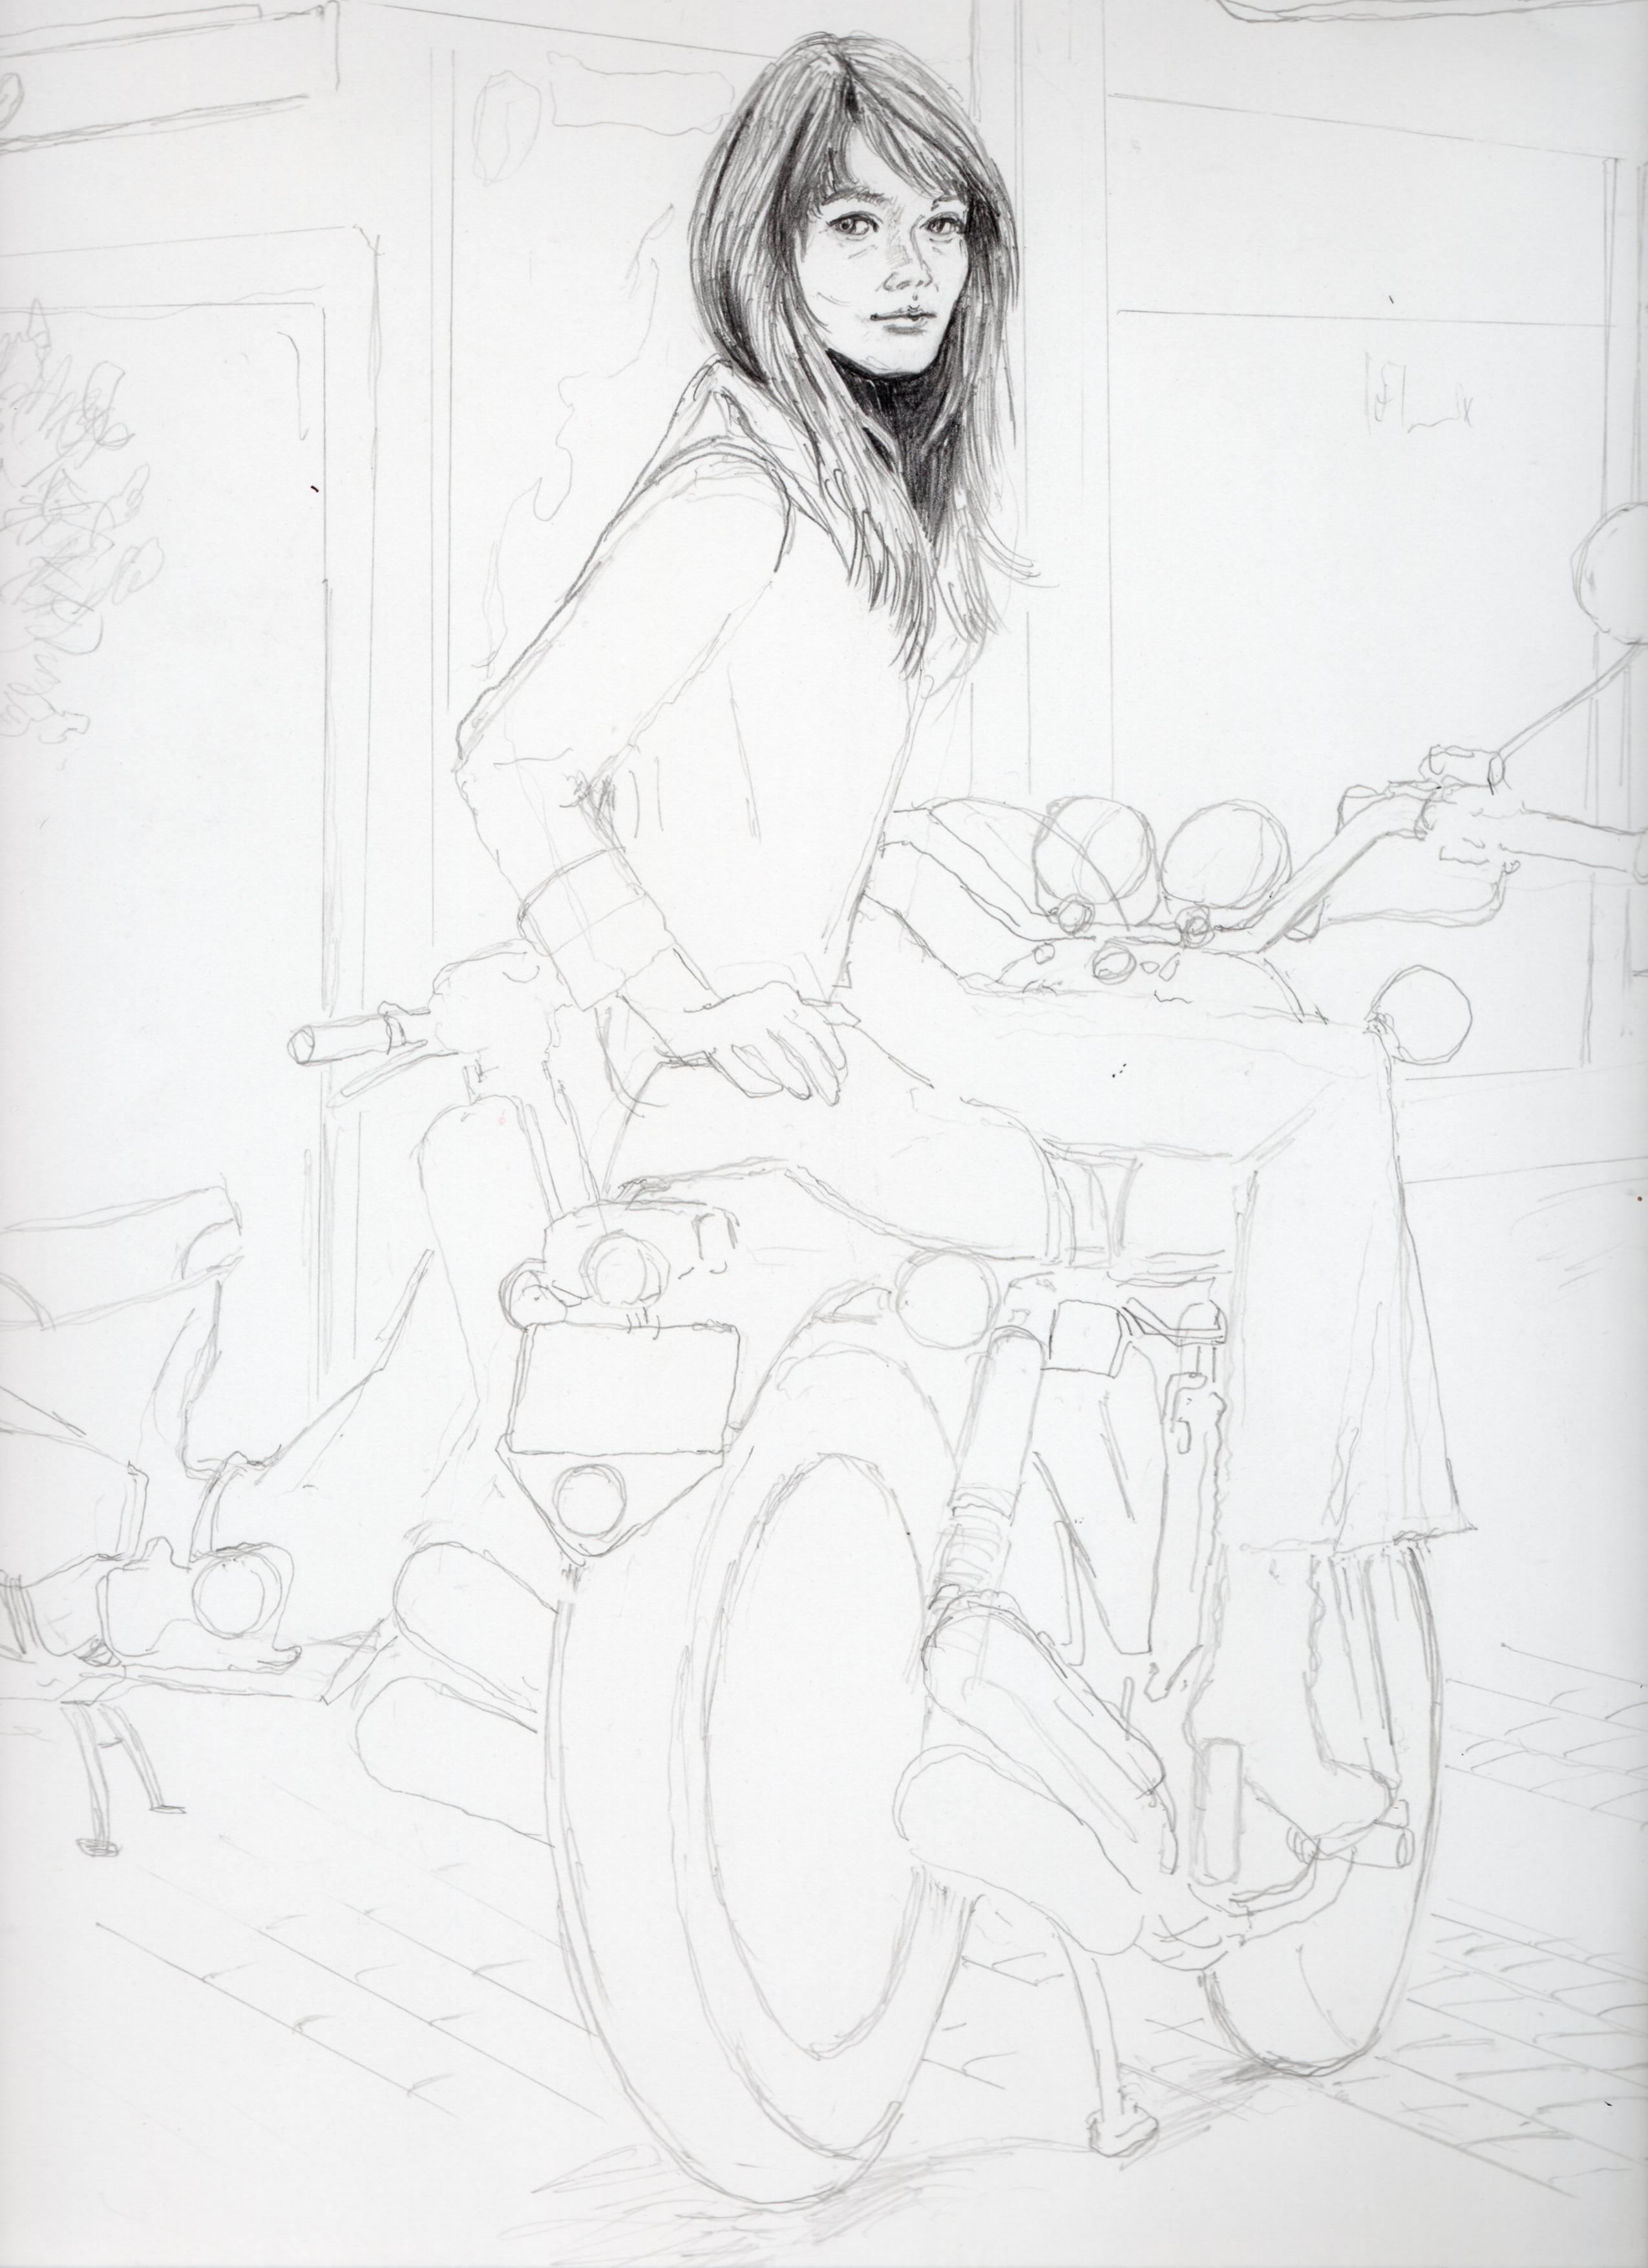 img916.jpg